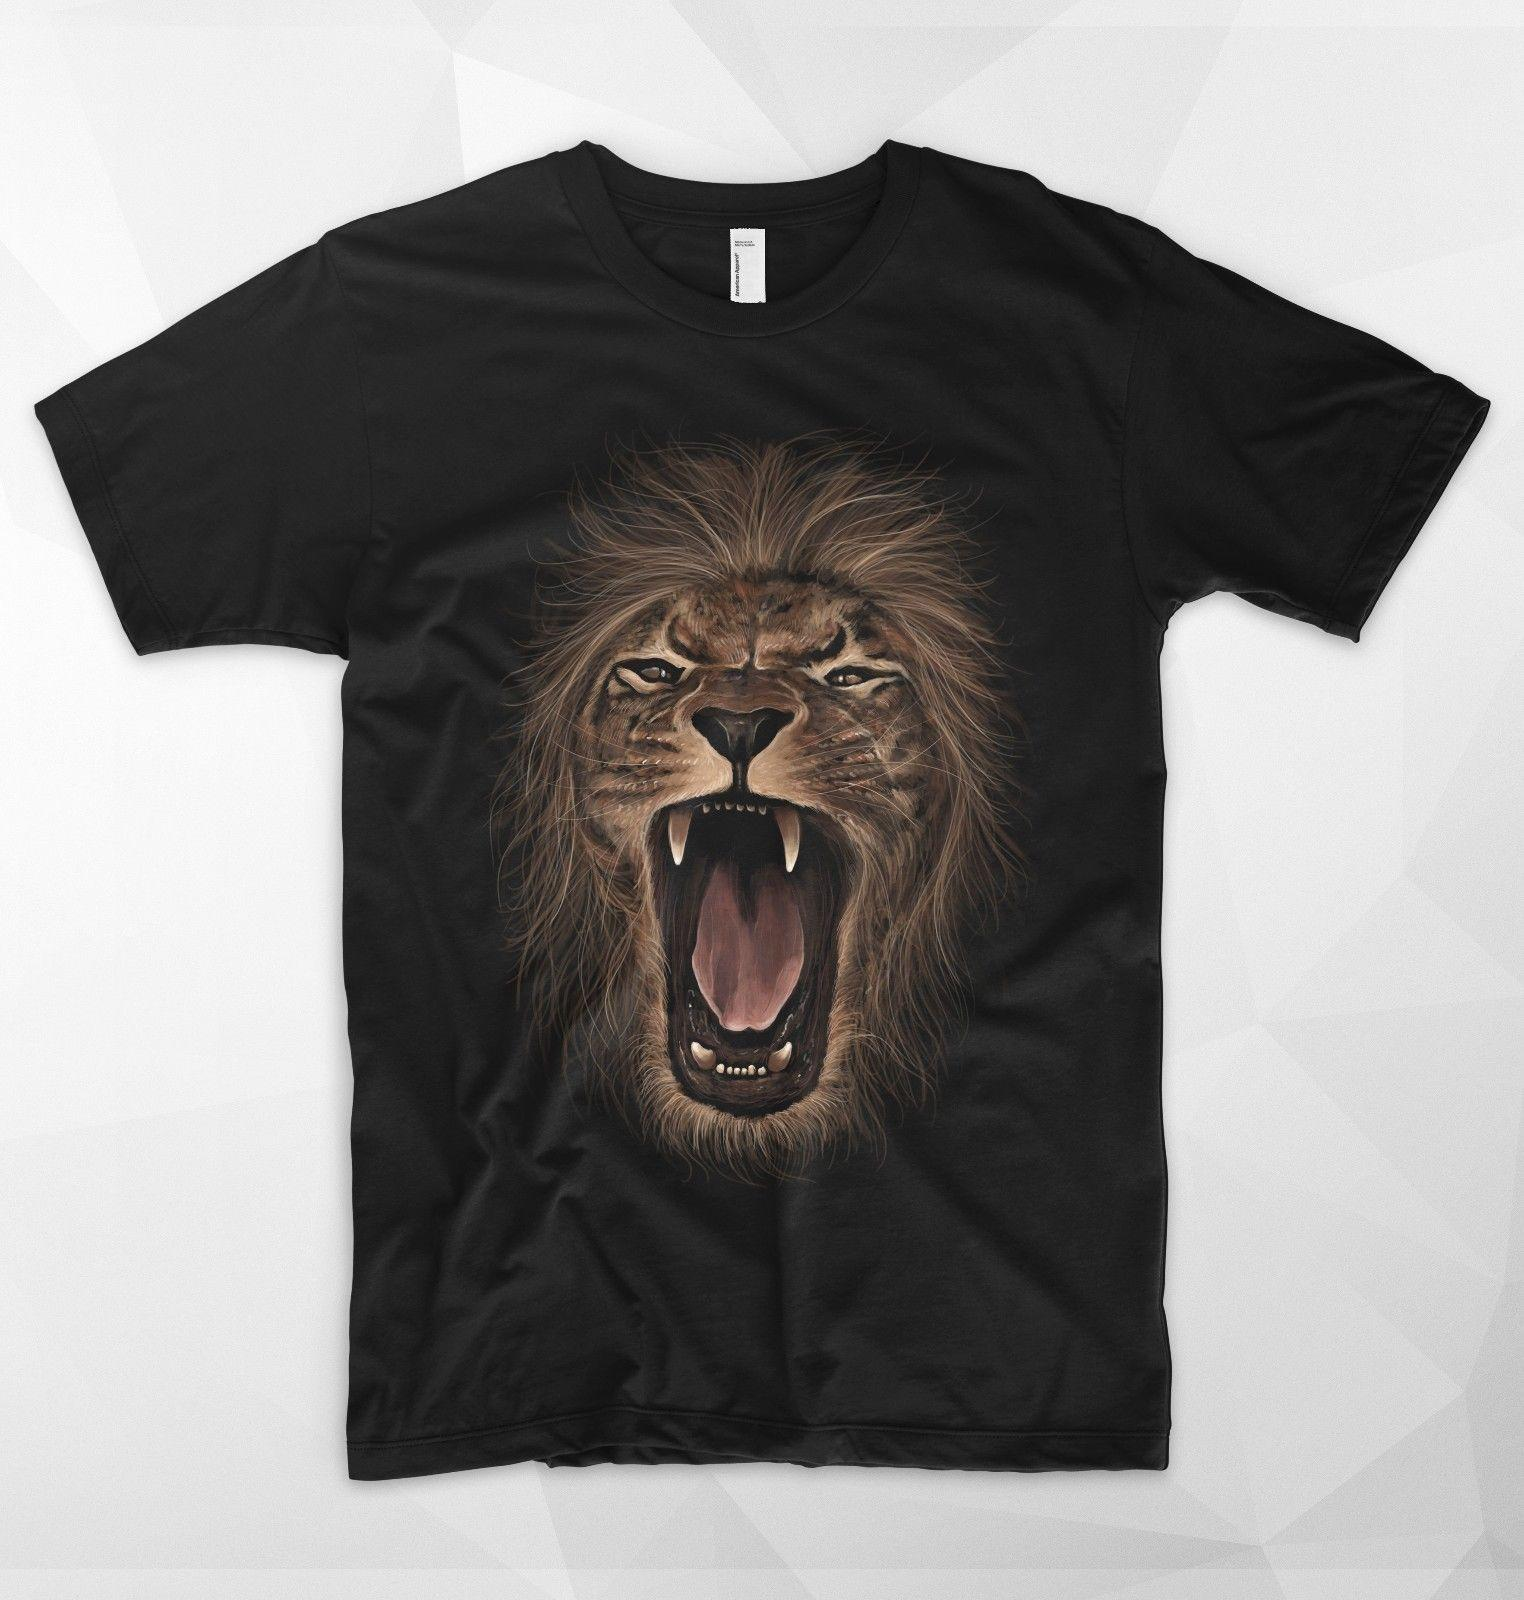 3fe261060 Lion Roar T Shirt King Of The Jungle Safari Wildlife Africa Simba Rege  Snoop Funny Unisex Gift T Shirt Designers Business Shirt From Topclassa, ...